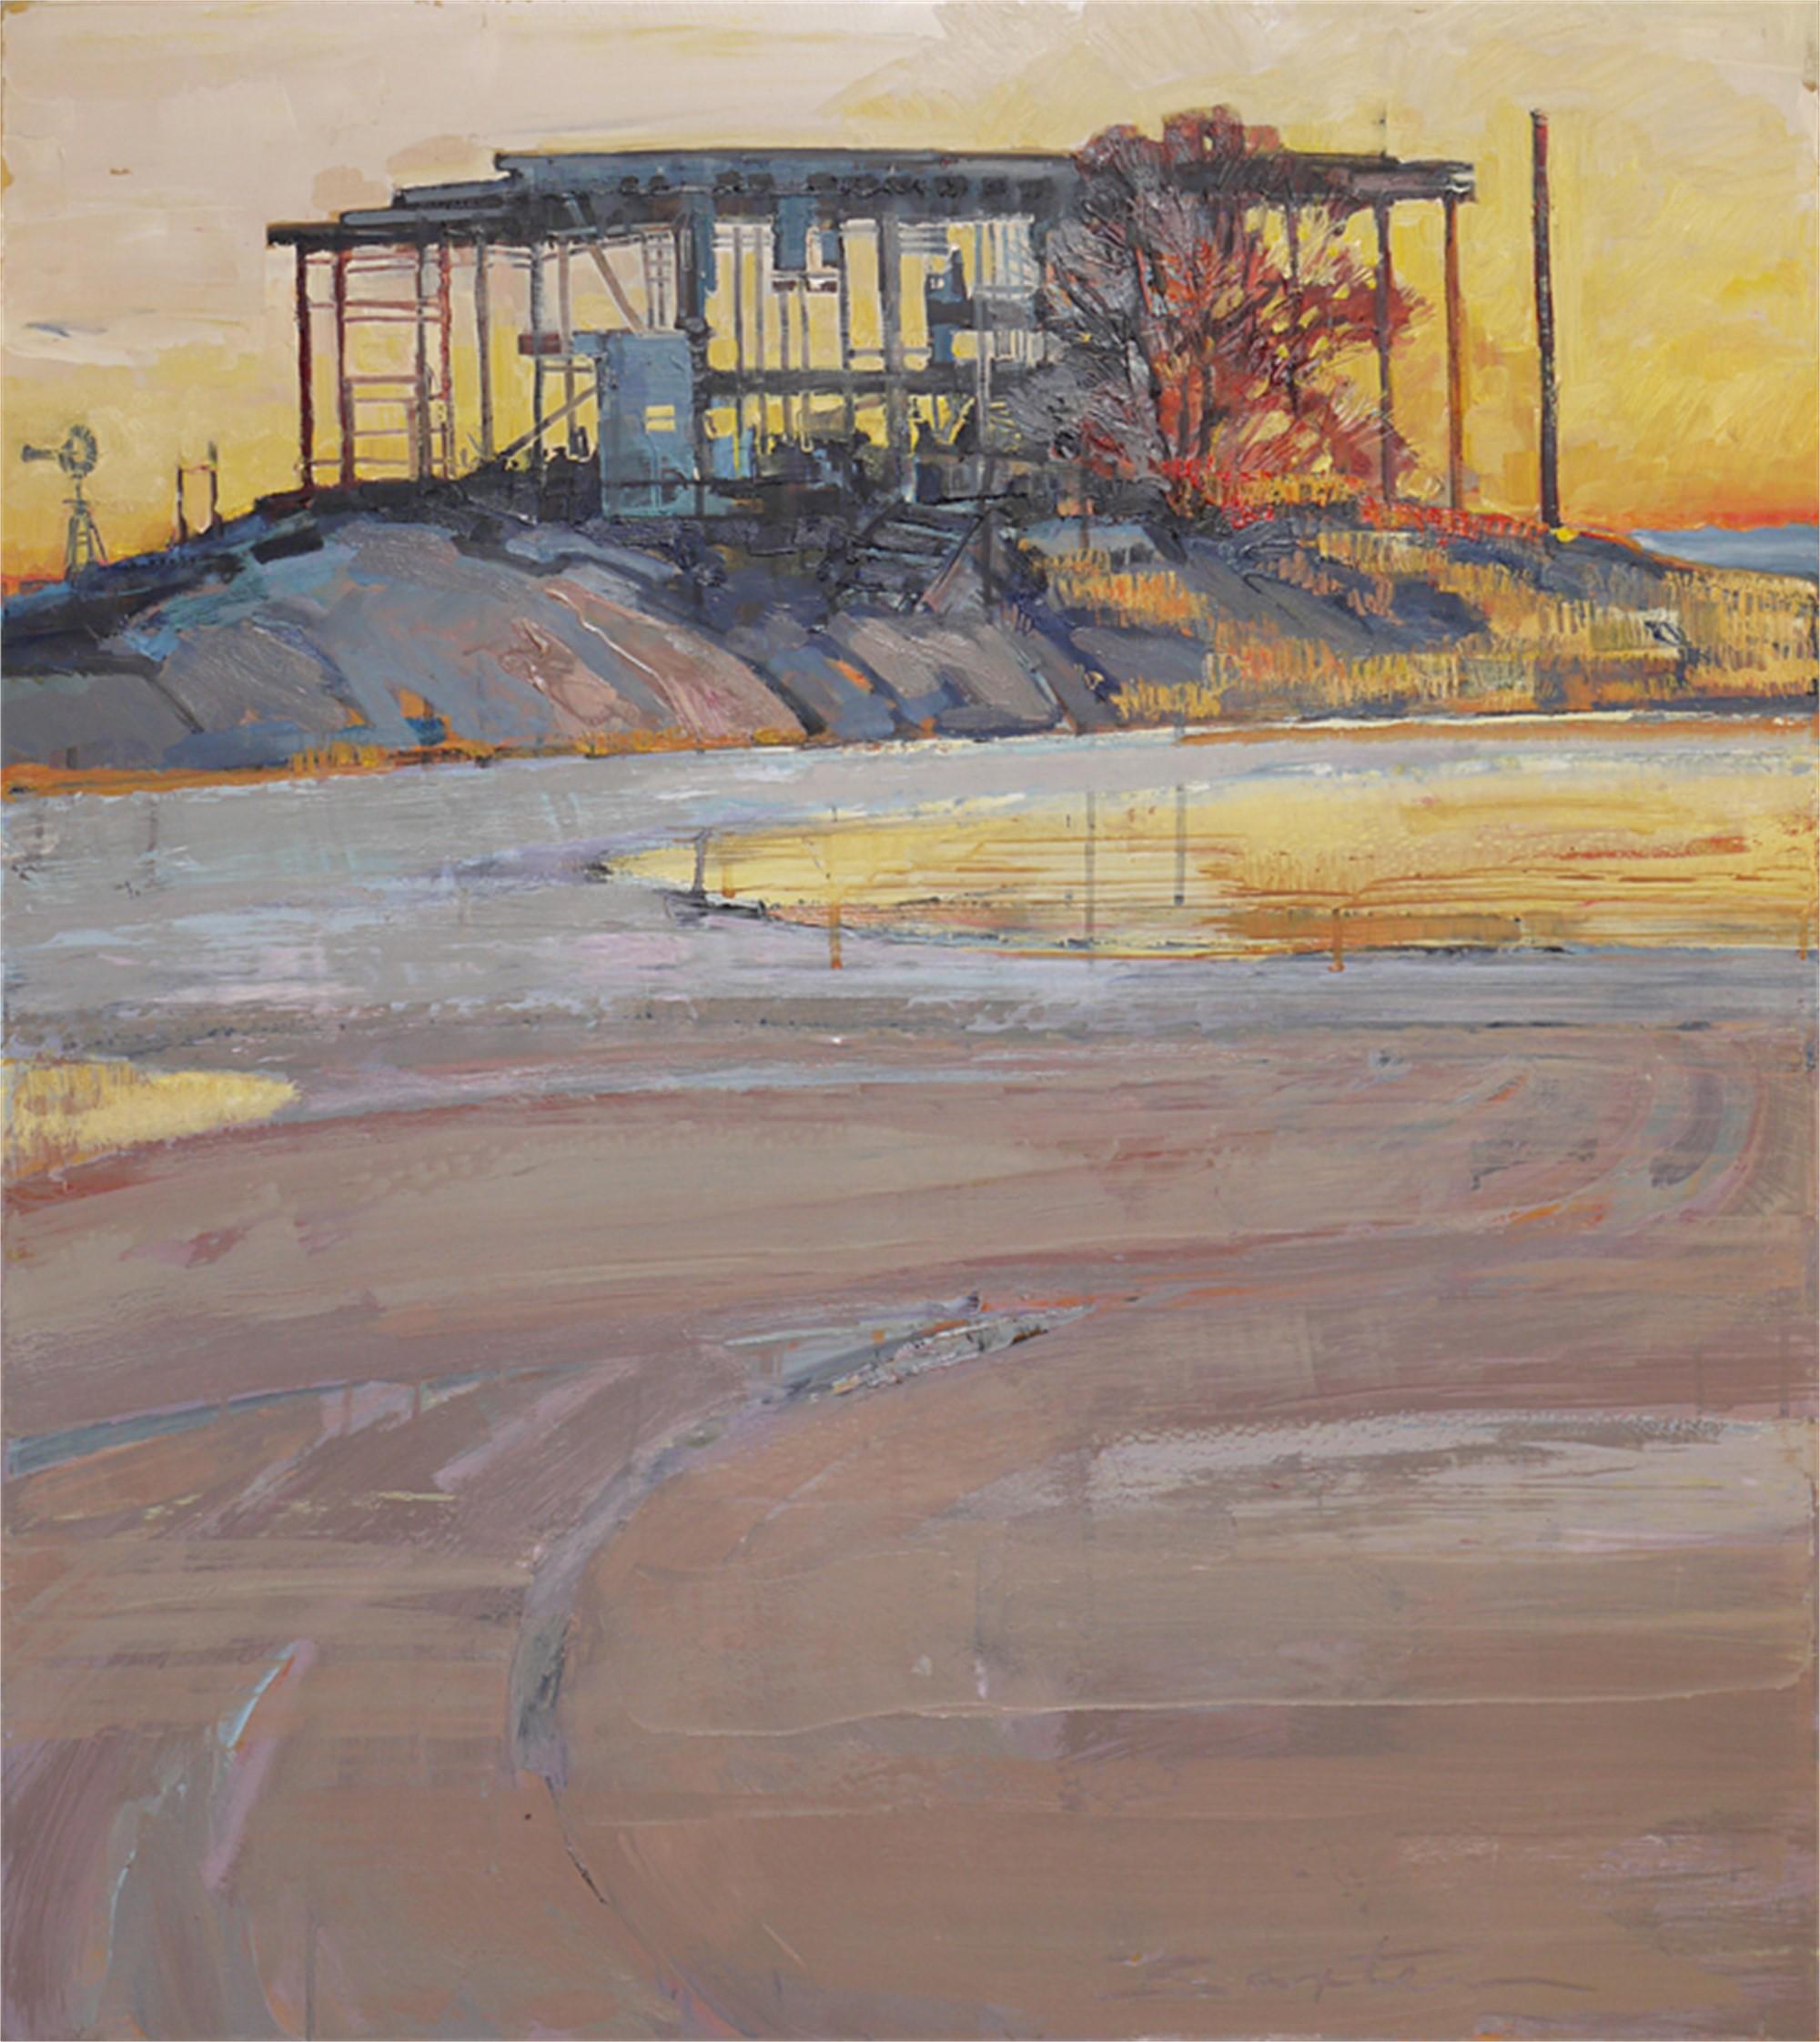 Abandoned Loading Dock by Mary Baxter